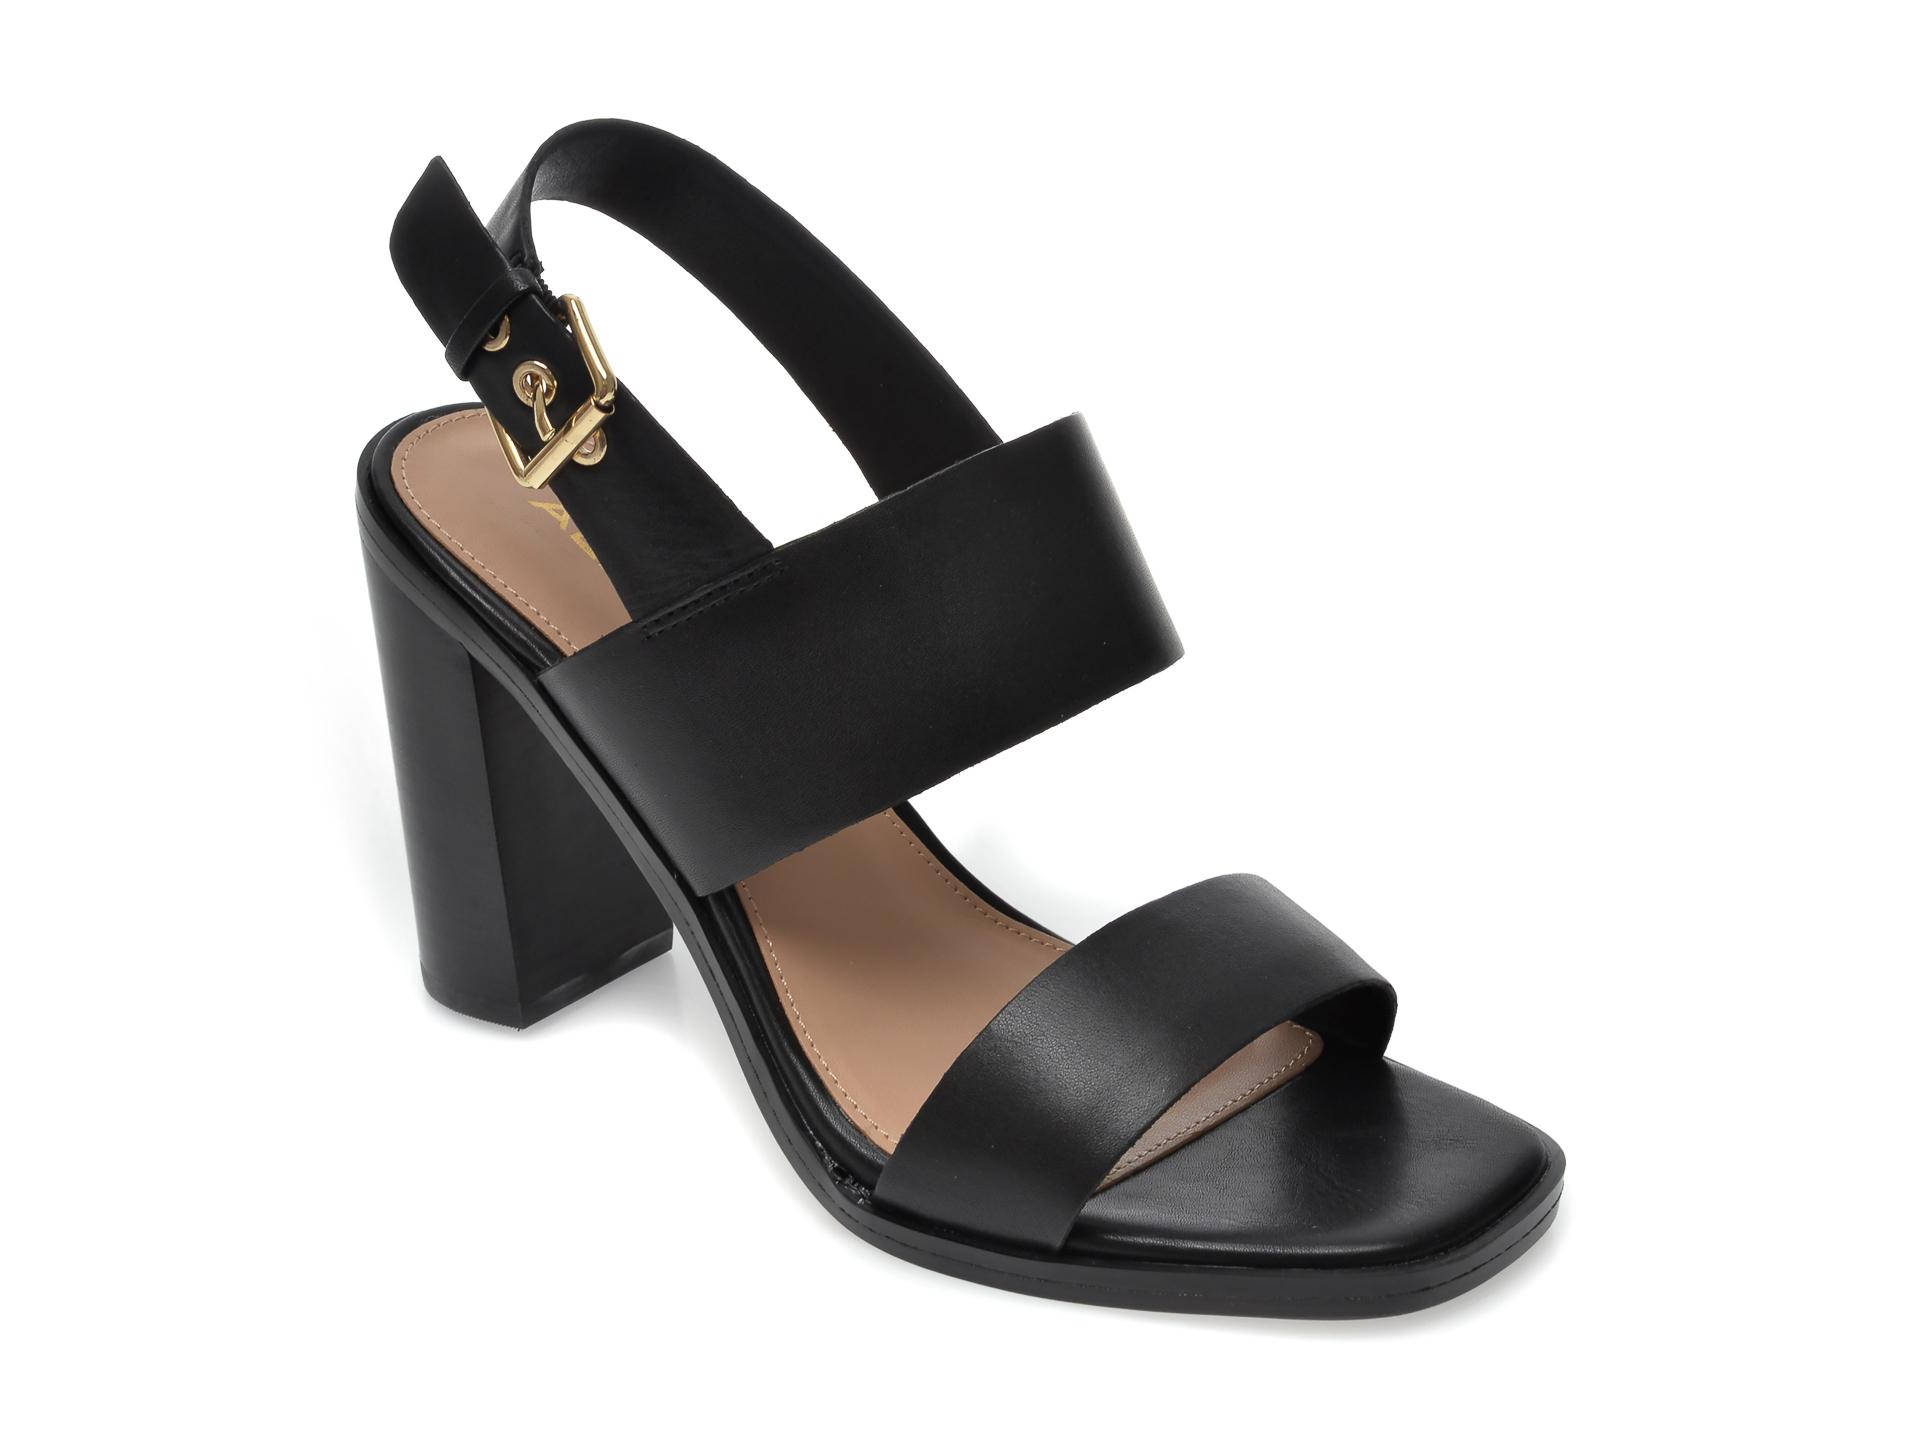 Sandale ALDO negre, Fielia001, din piele naturala imagine otter.ro 2021